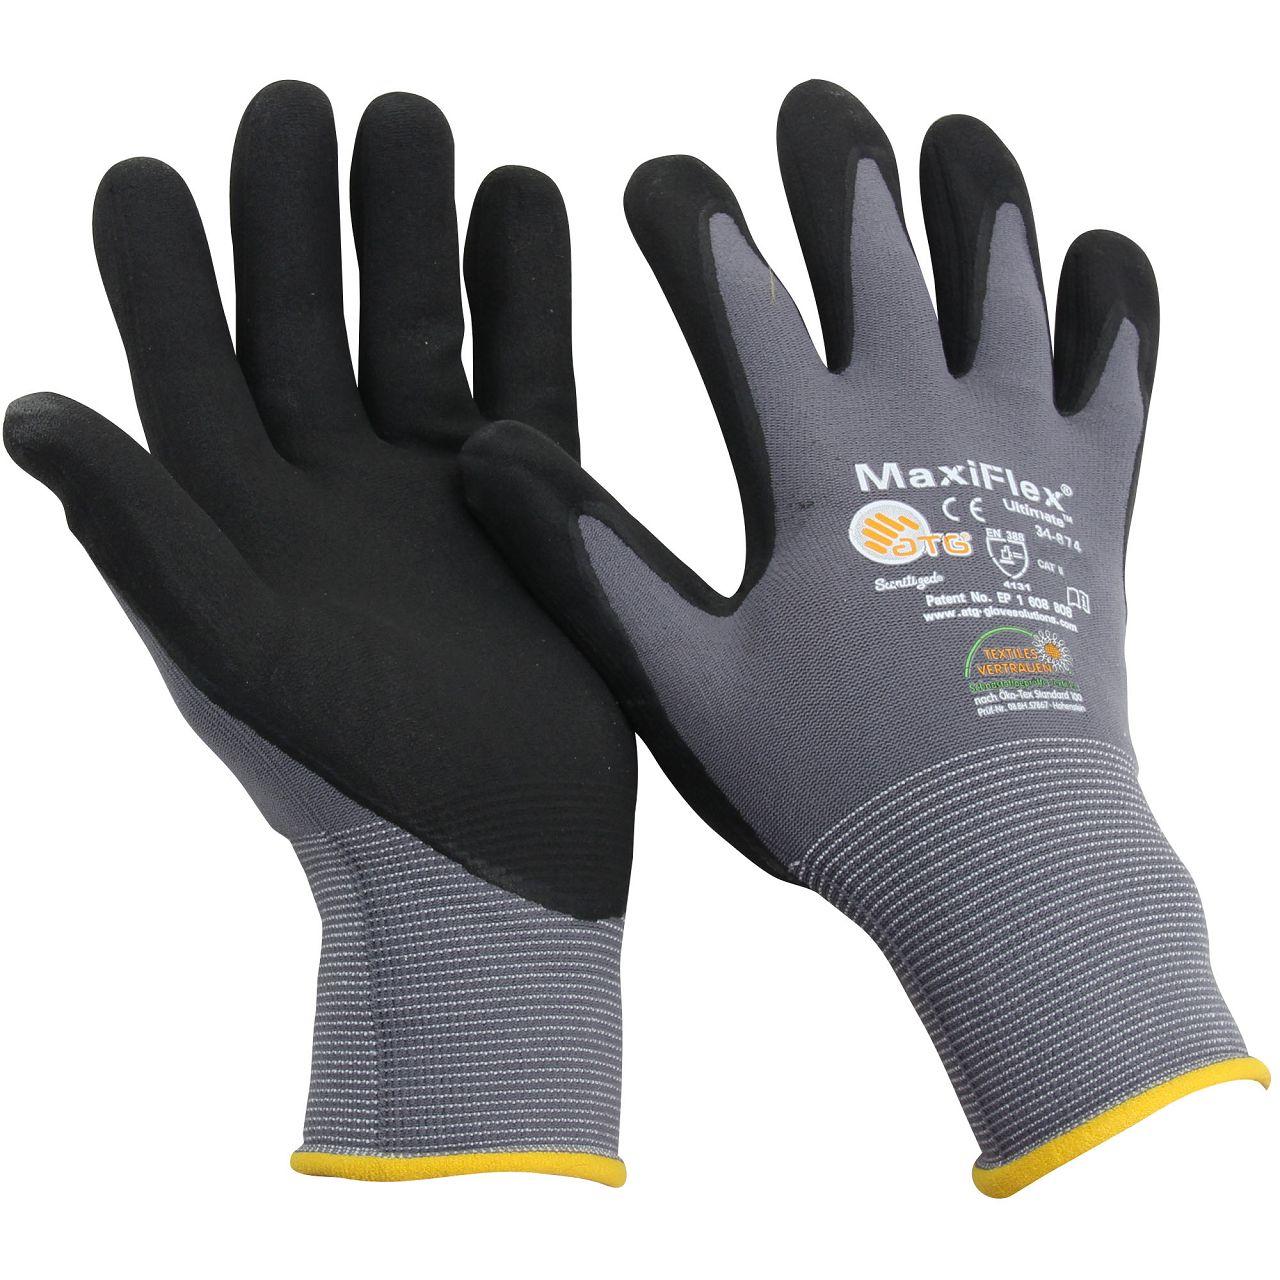 MAXIFLEX Ultimate ATG Texxor Handschuhe Arbeitshandschuhe Größe 10 / XL (1 Paar)